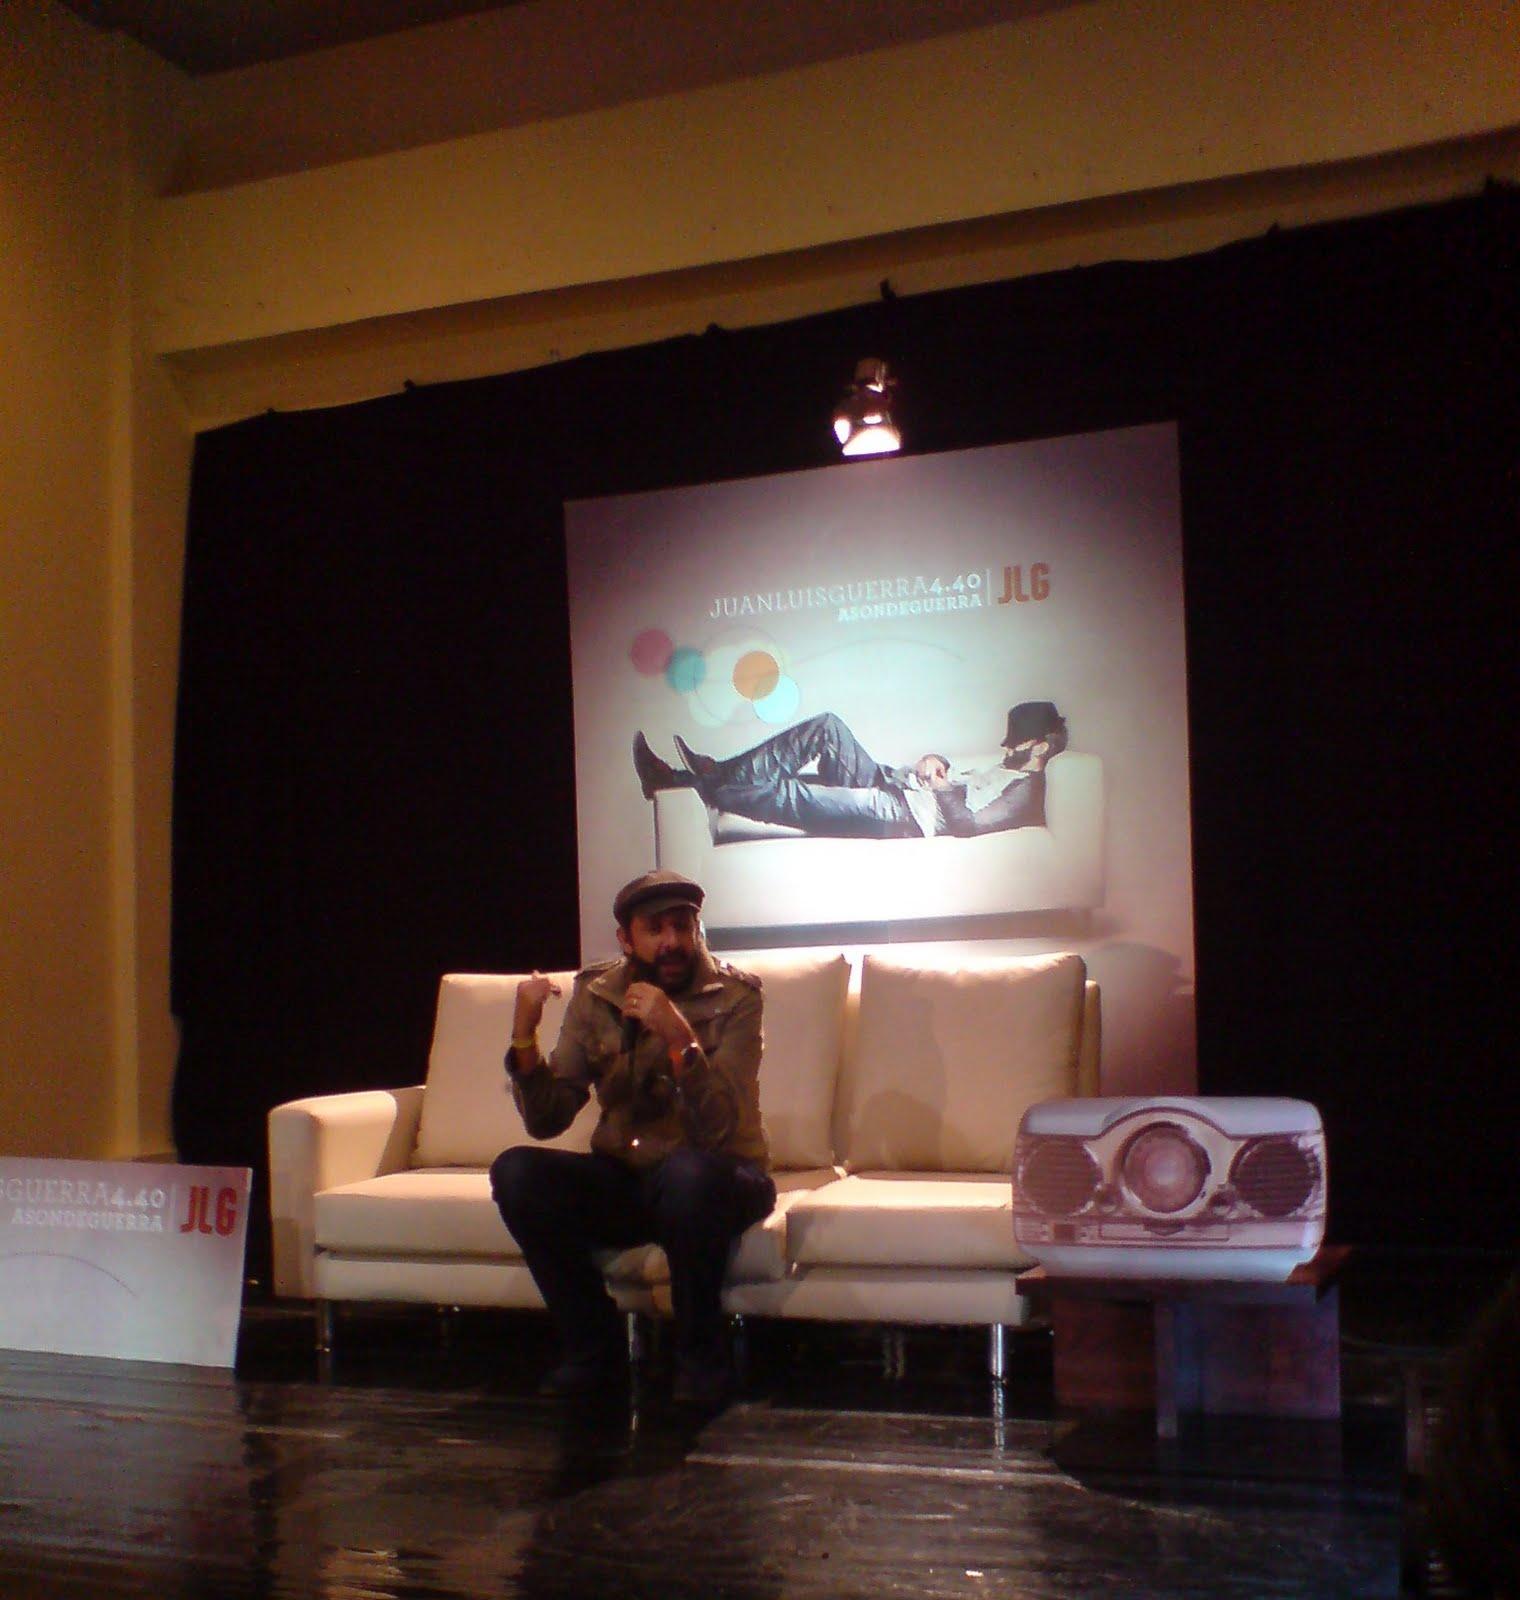 http://1.bp.blogspot.com/_y-F1SBc3pTM/TFE_I76CviI/AAAAAAAAA4c/AL2bjEX37q8/s1600/Juan+Luis+Guerra+2.JPG